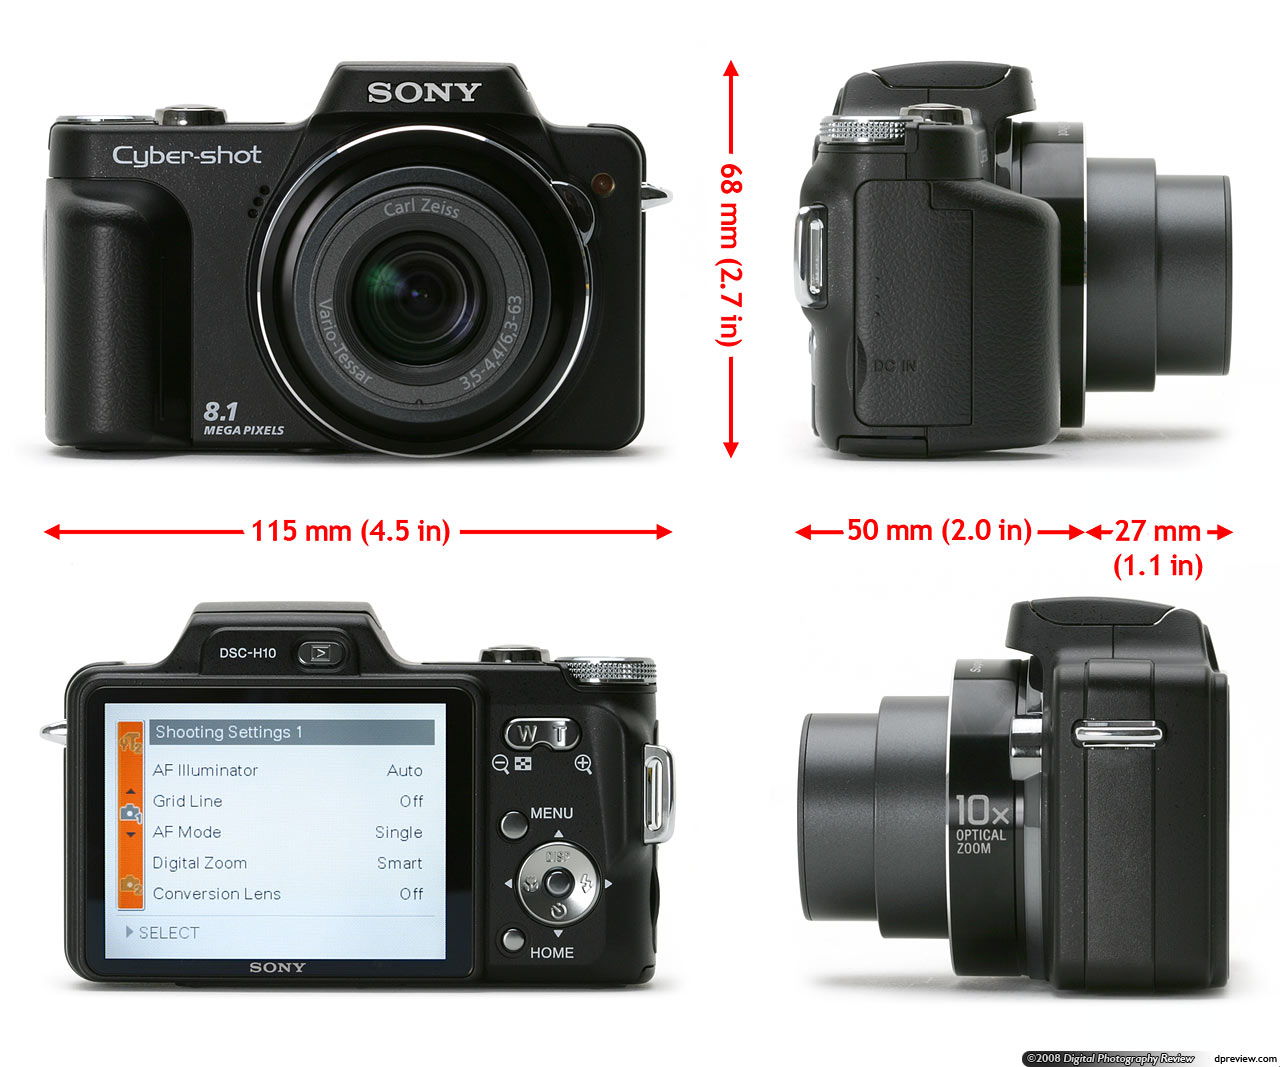 sony cyber shot dsc h10 concise review digital photography review rh dpreview com DSC-H10 Accessories Dsc- W35